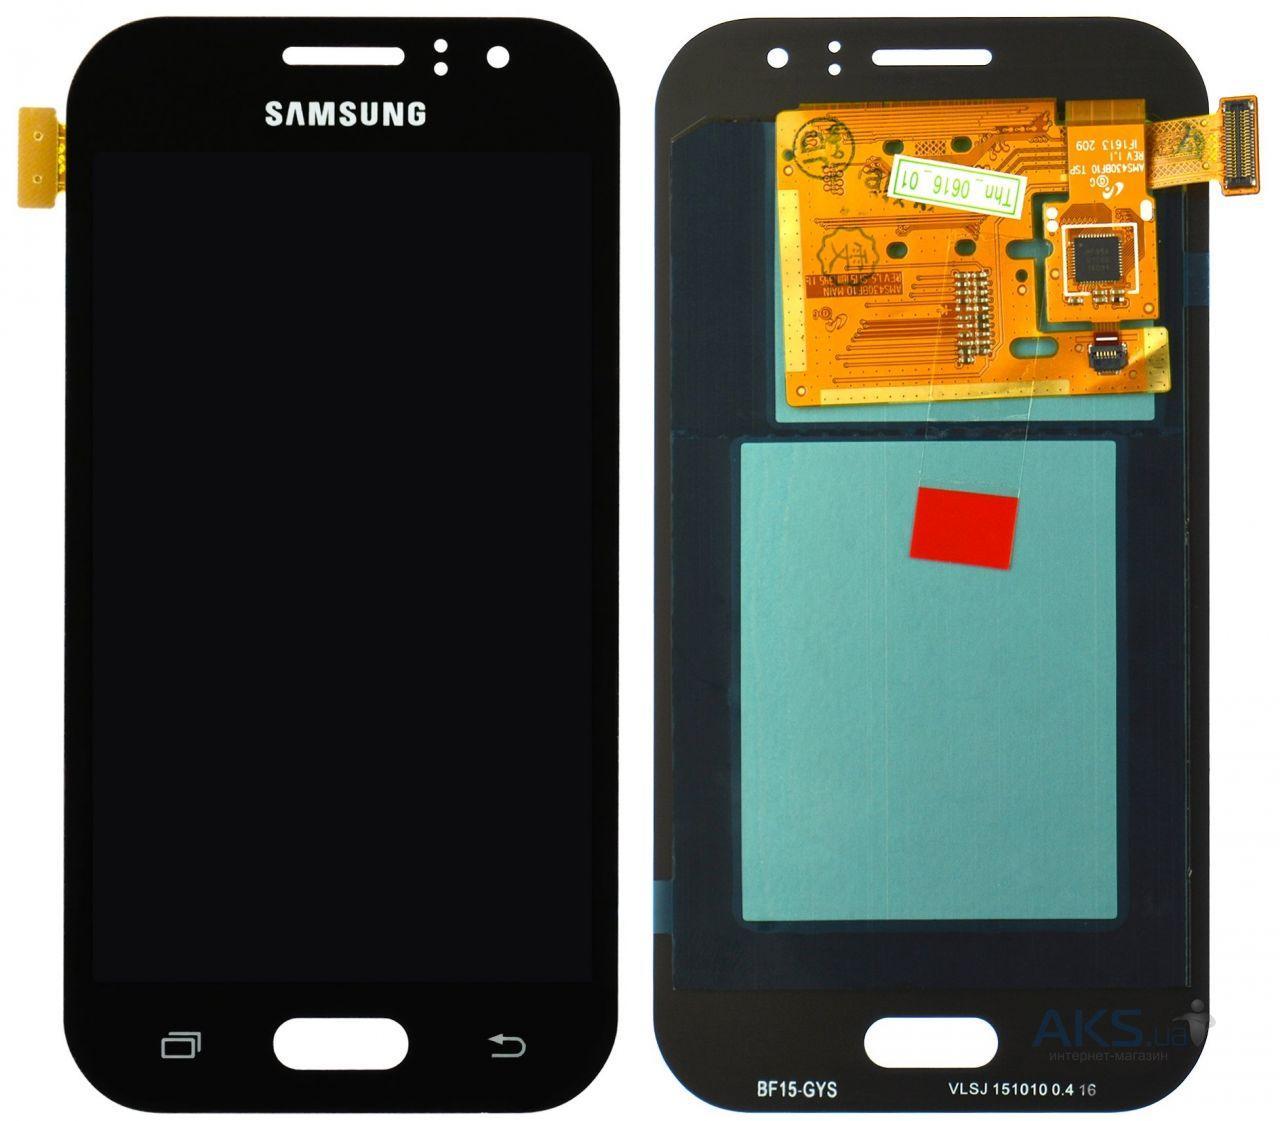 Samsung Galaxy J1 Ace Duos J110H Dual Sim J110G J110L